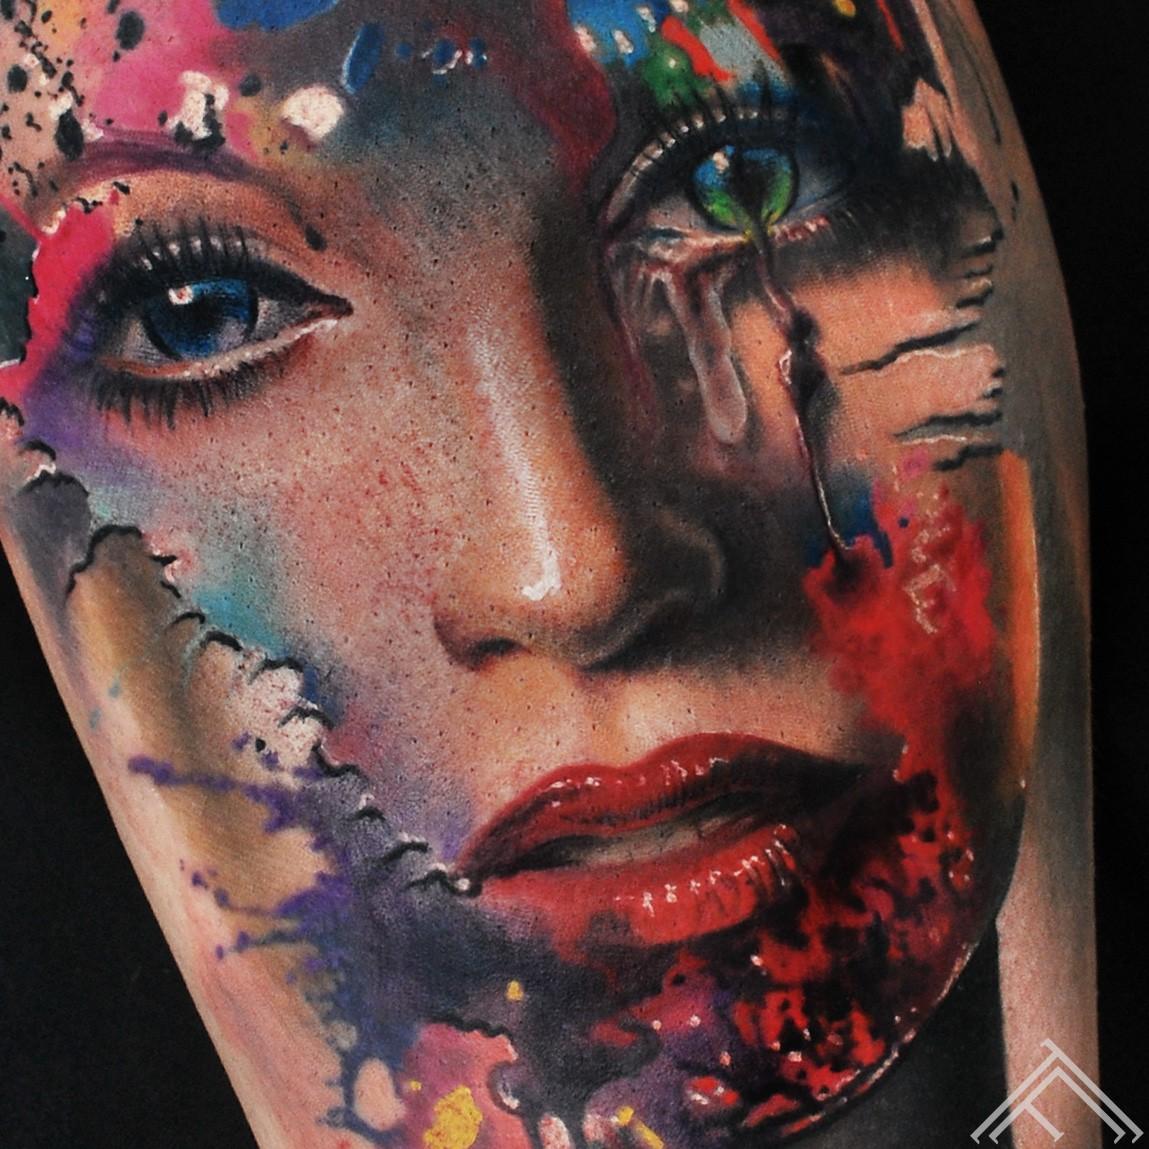 woman-color-colour-krasas-sieviete-portrait-portrets-tattoo-tetovejums-ink-tattoofrequency-riga-marispavlo-macro